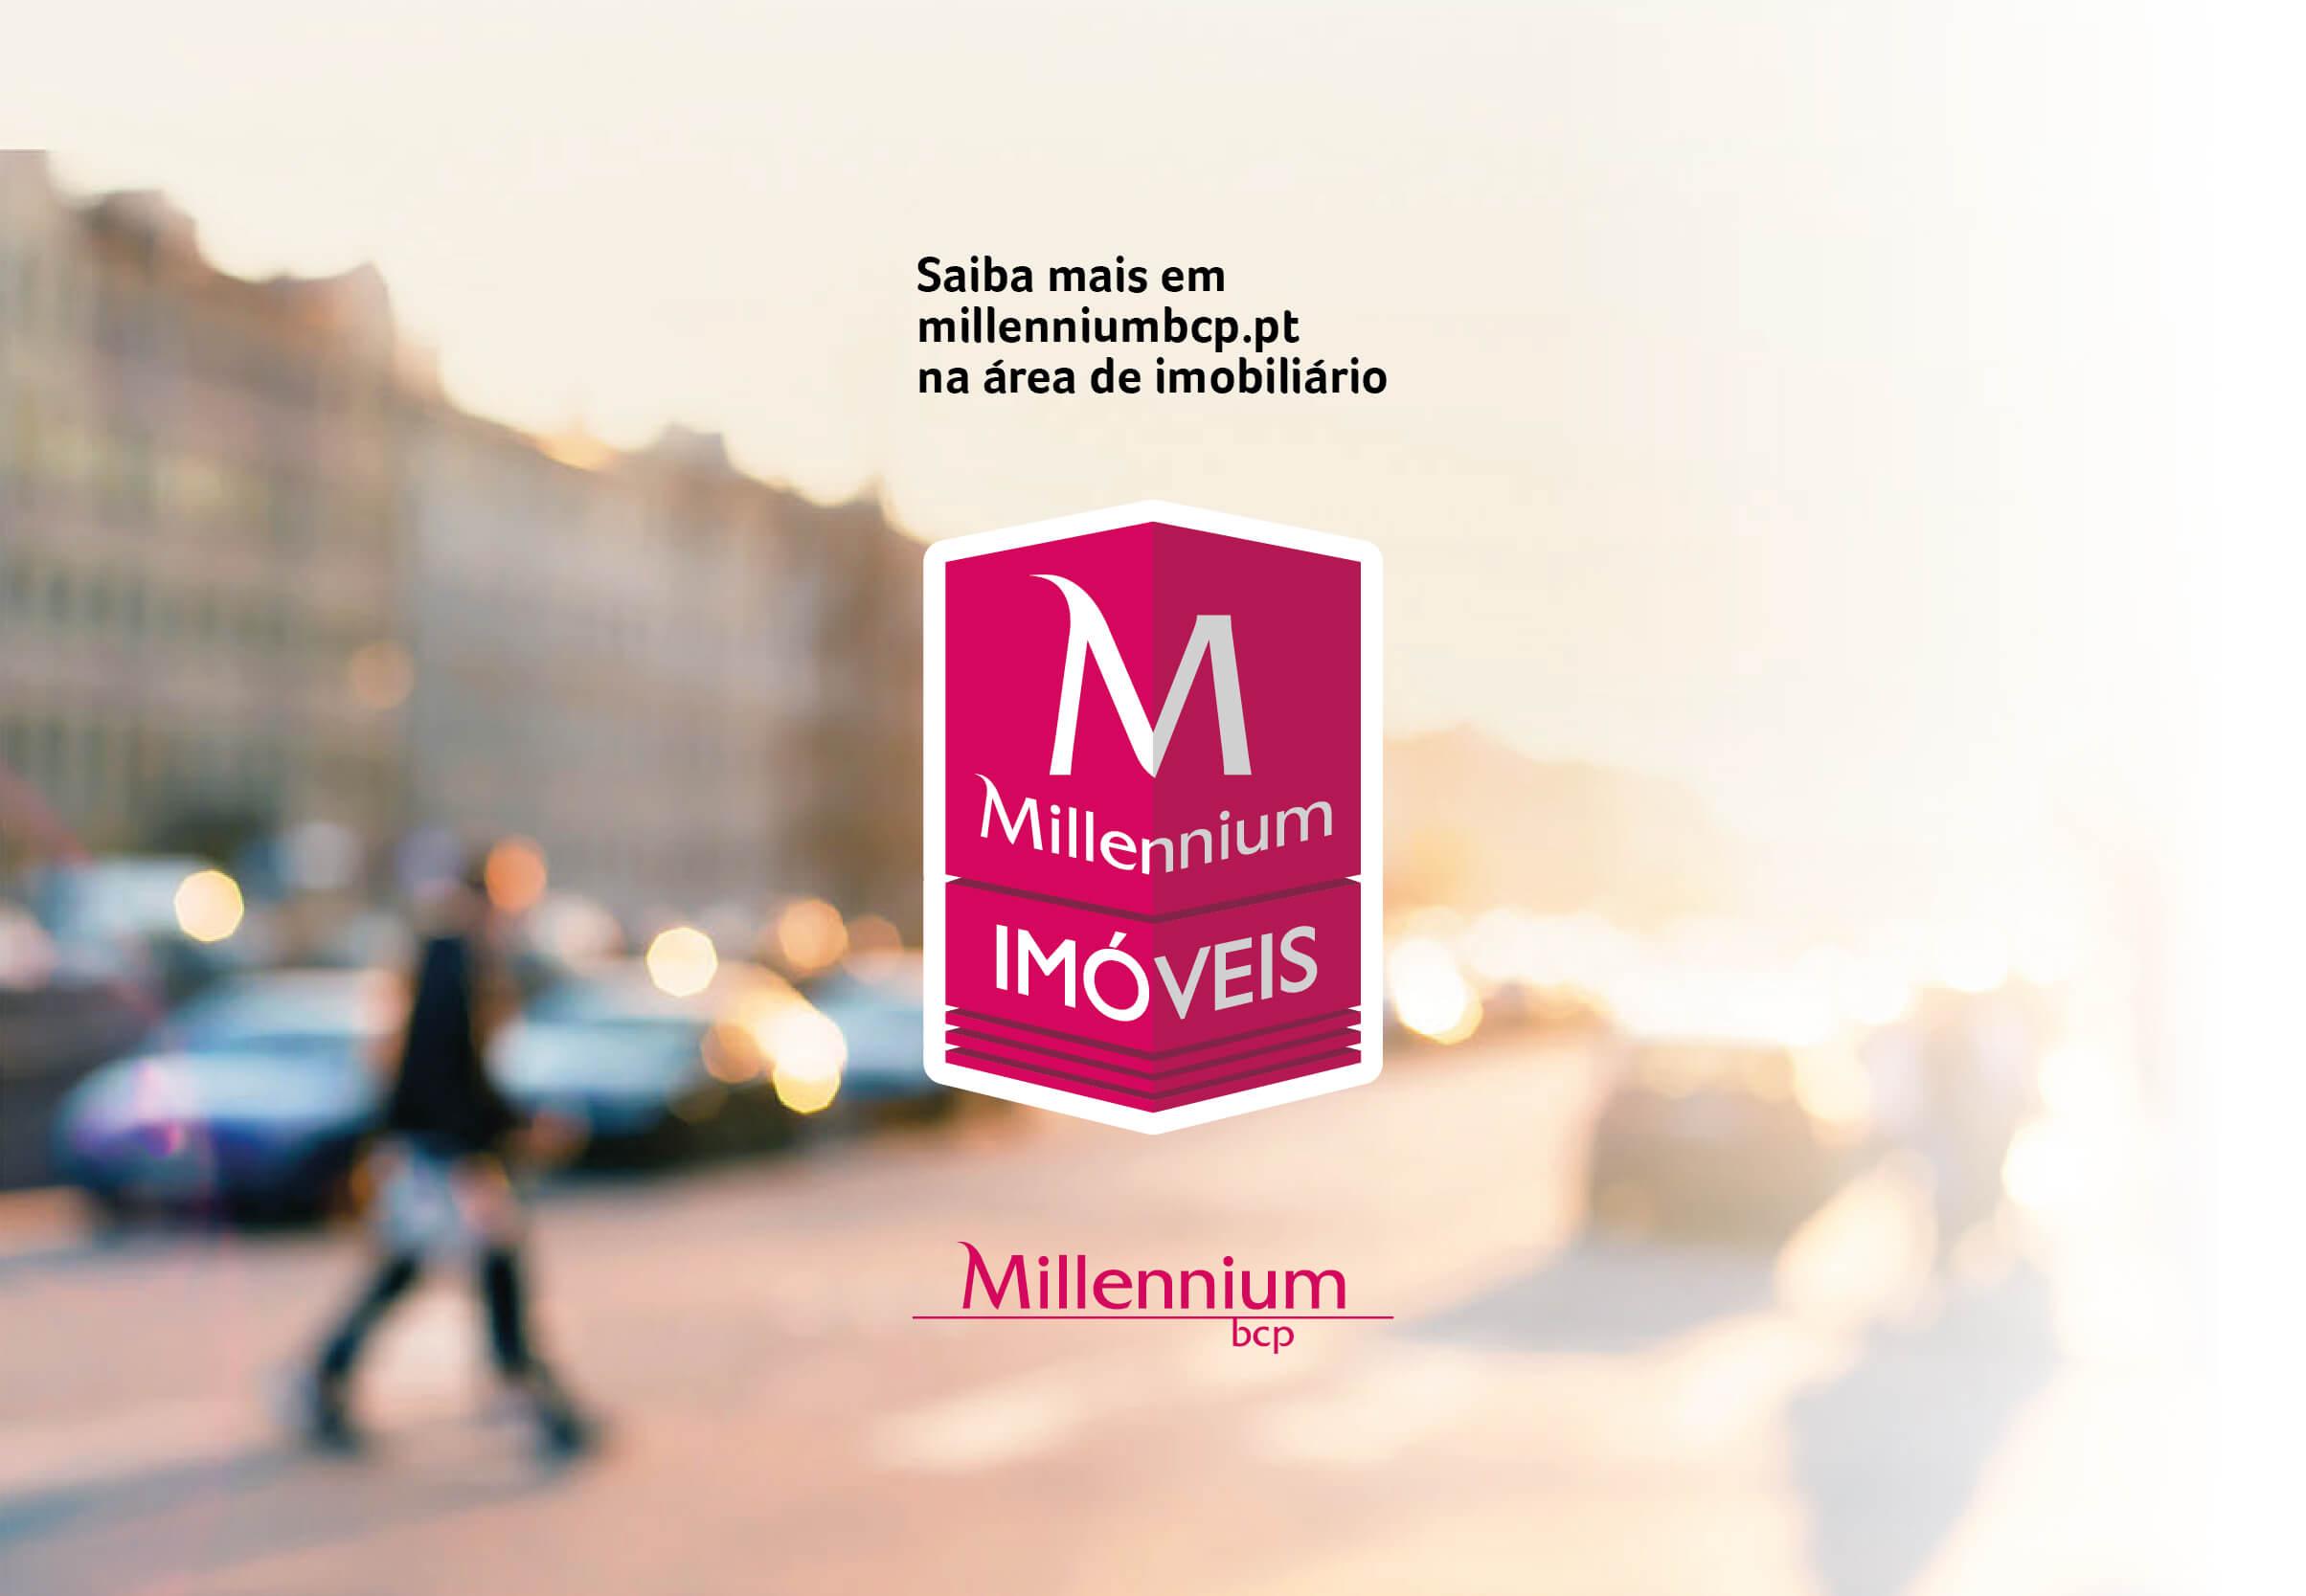 Millennium BCP Imóveis - Sizmek HTML5 Ad | Luis Serra Freelancer